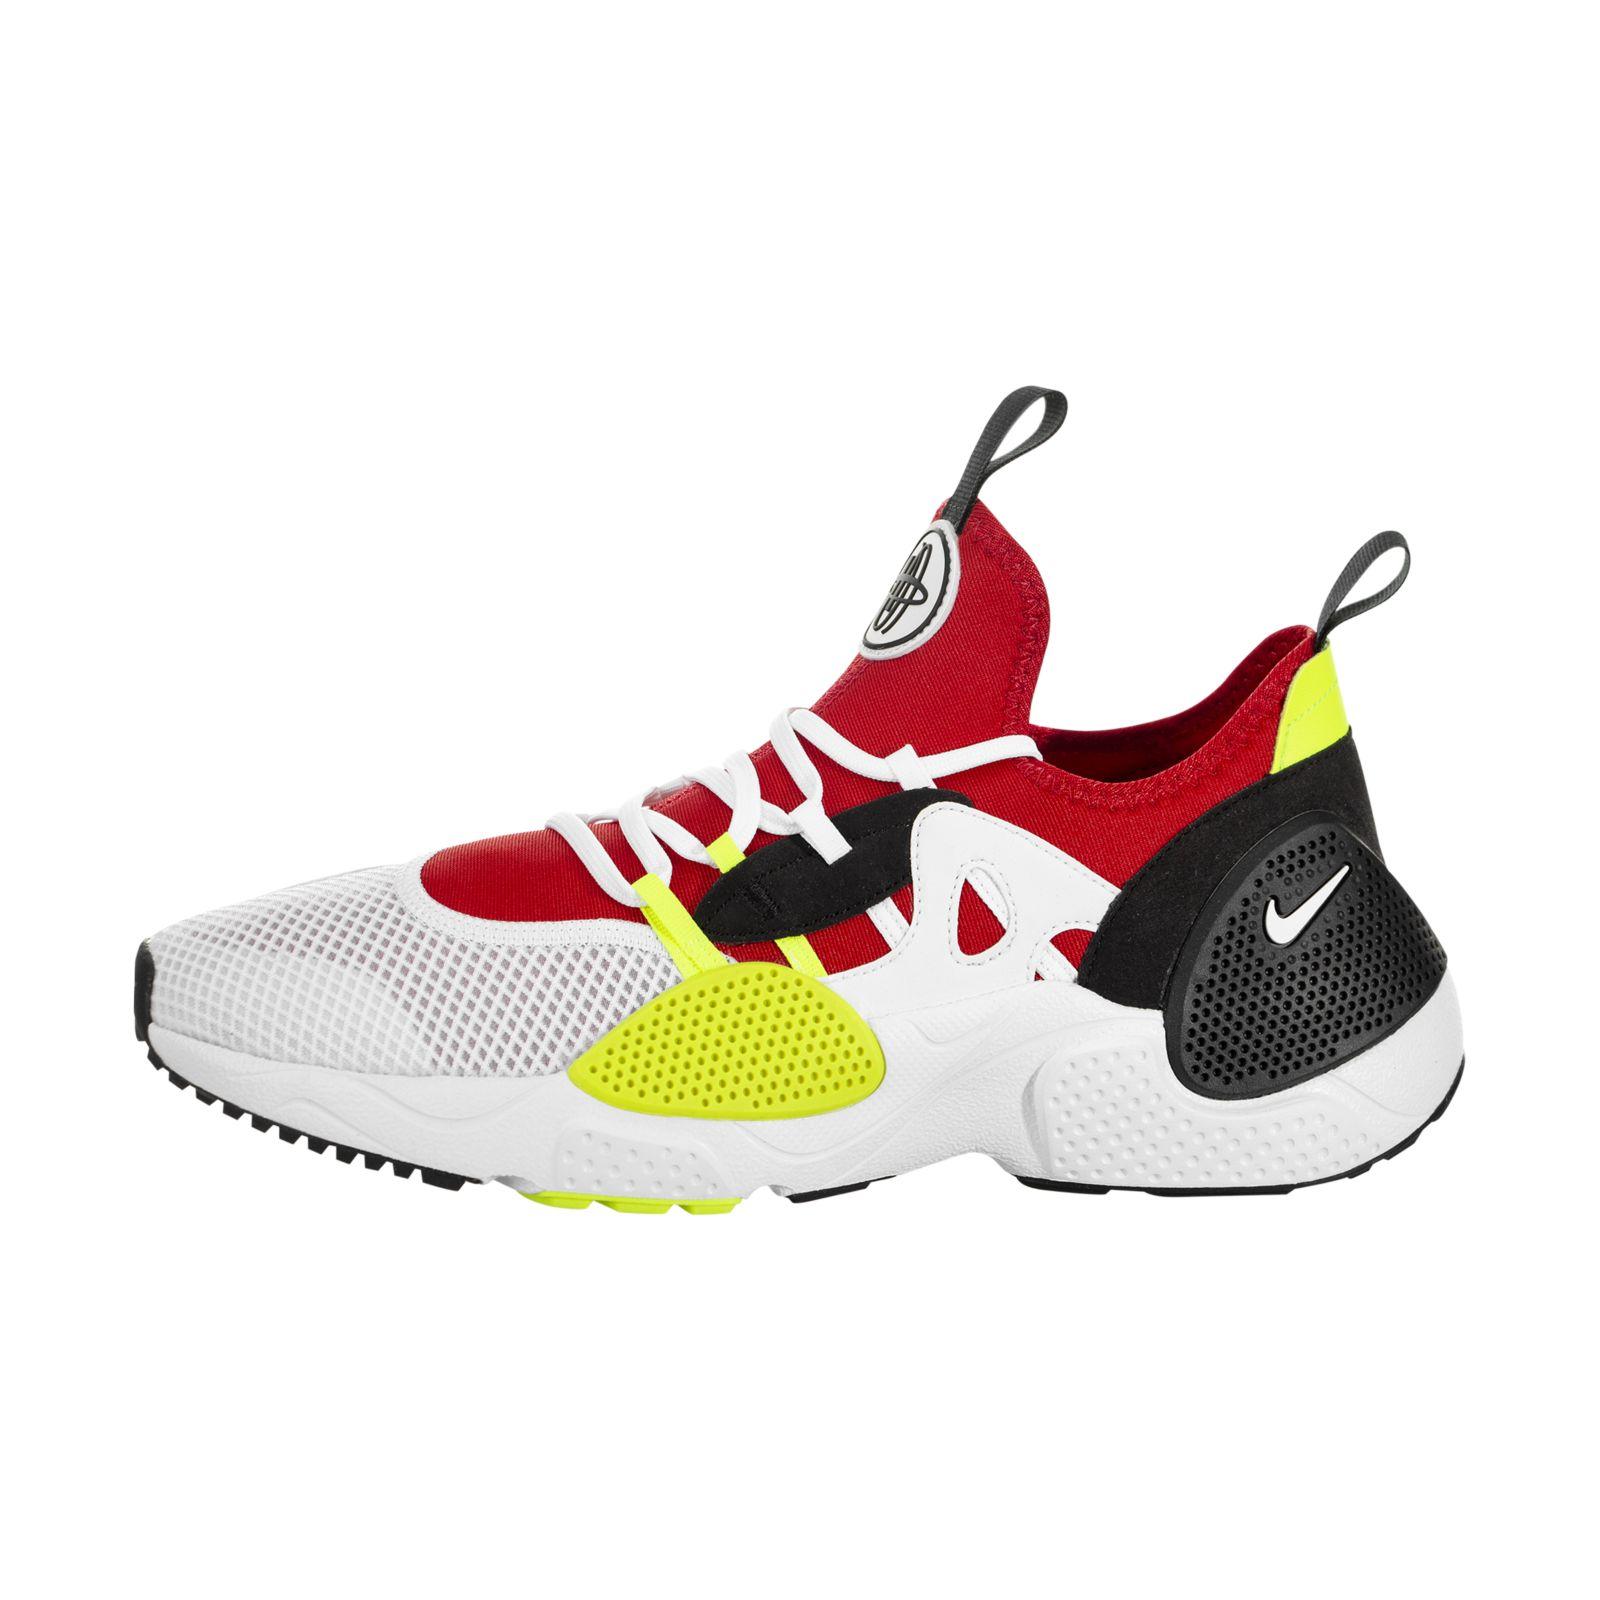 aa3d1905b453 Image is loading Nike-Huarache-E-D-G-E-TXT-ao1697-100